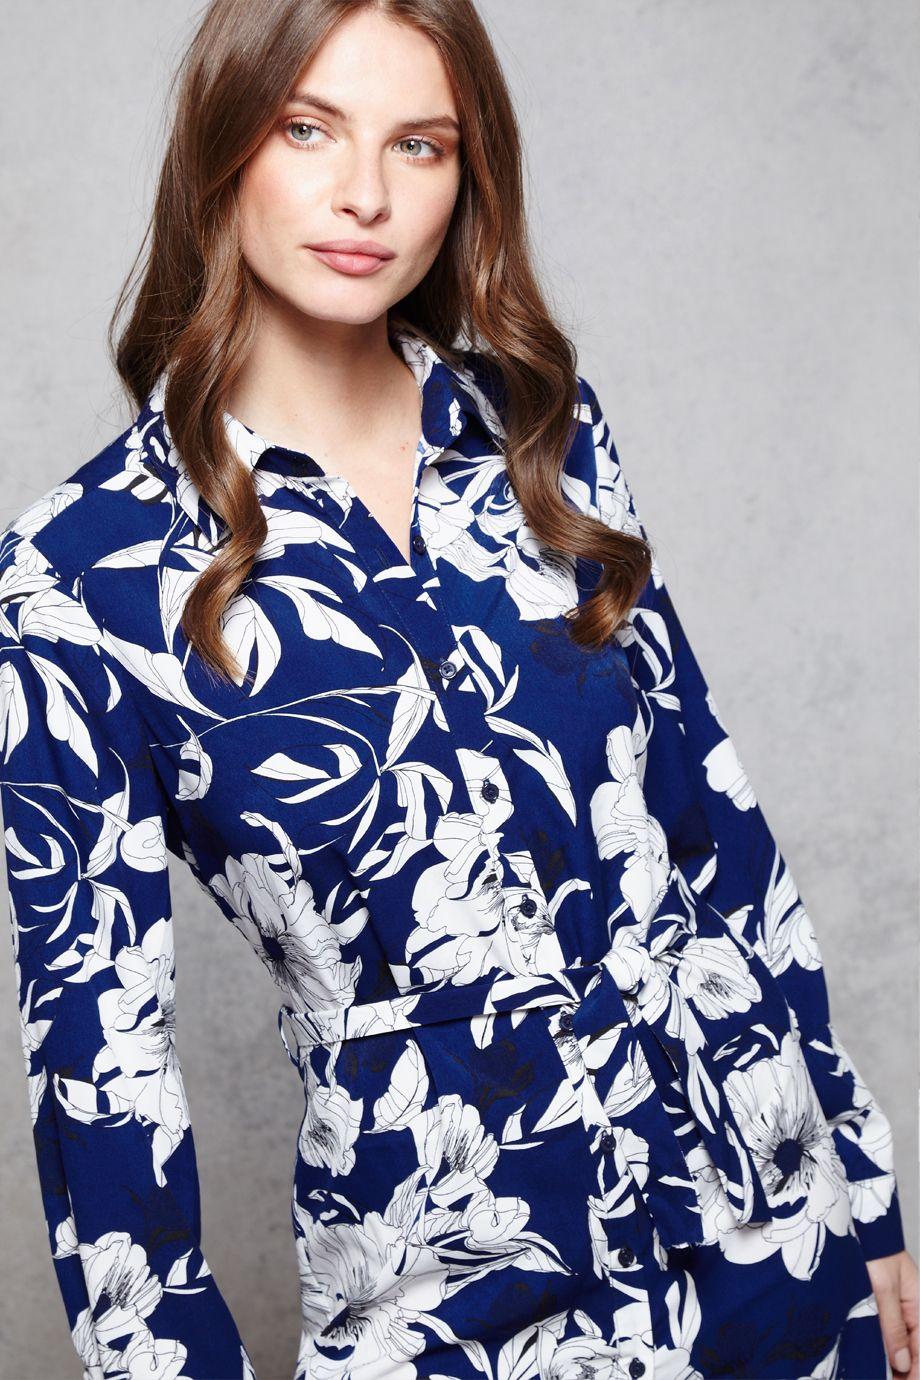 434d4745146a Σεμιζιε φορεμα με εντυπωσιακο floral τυπωμα σε ασπρο καο εντονο μπλε ...